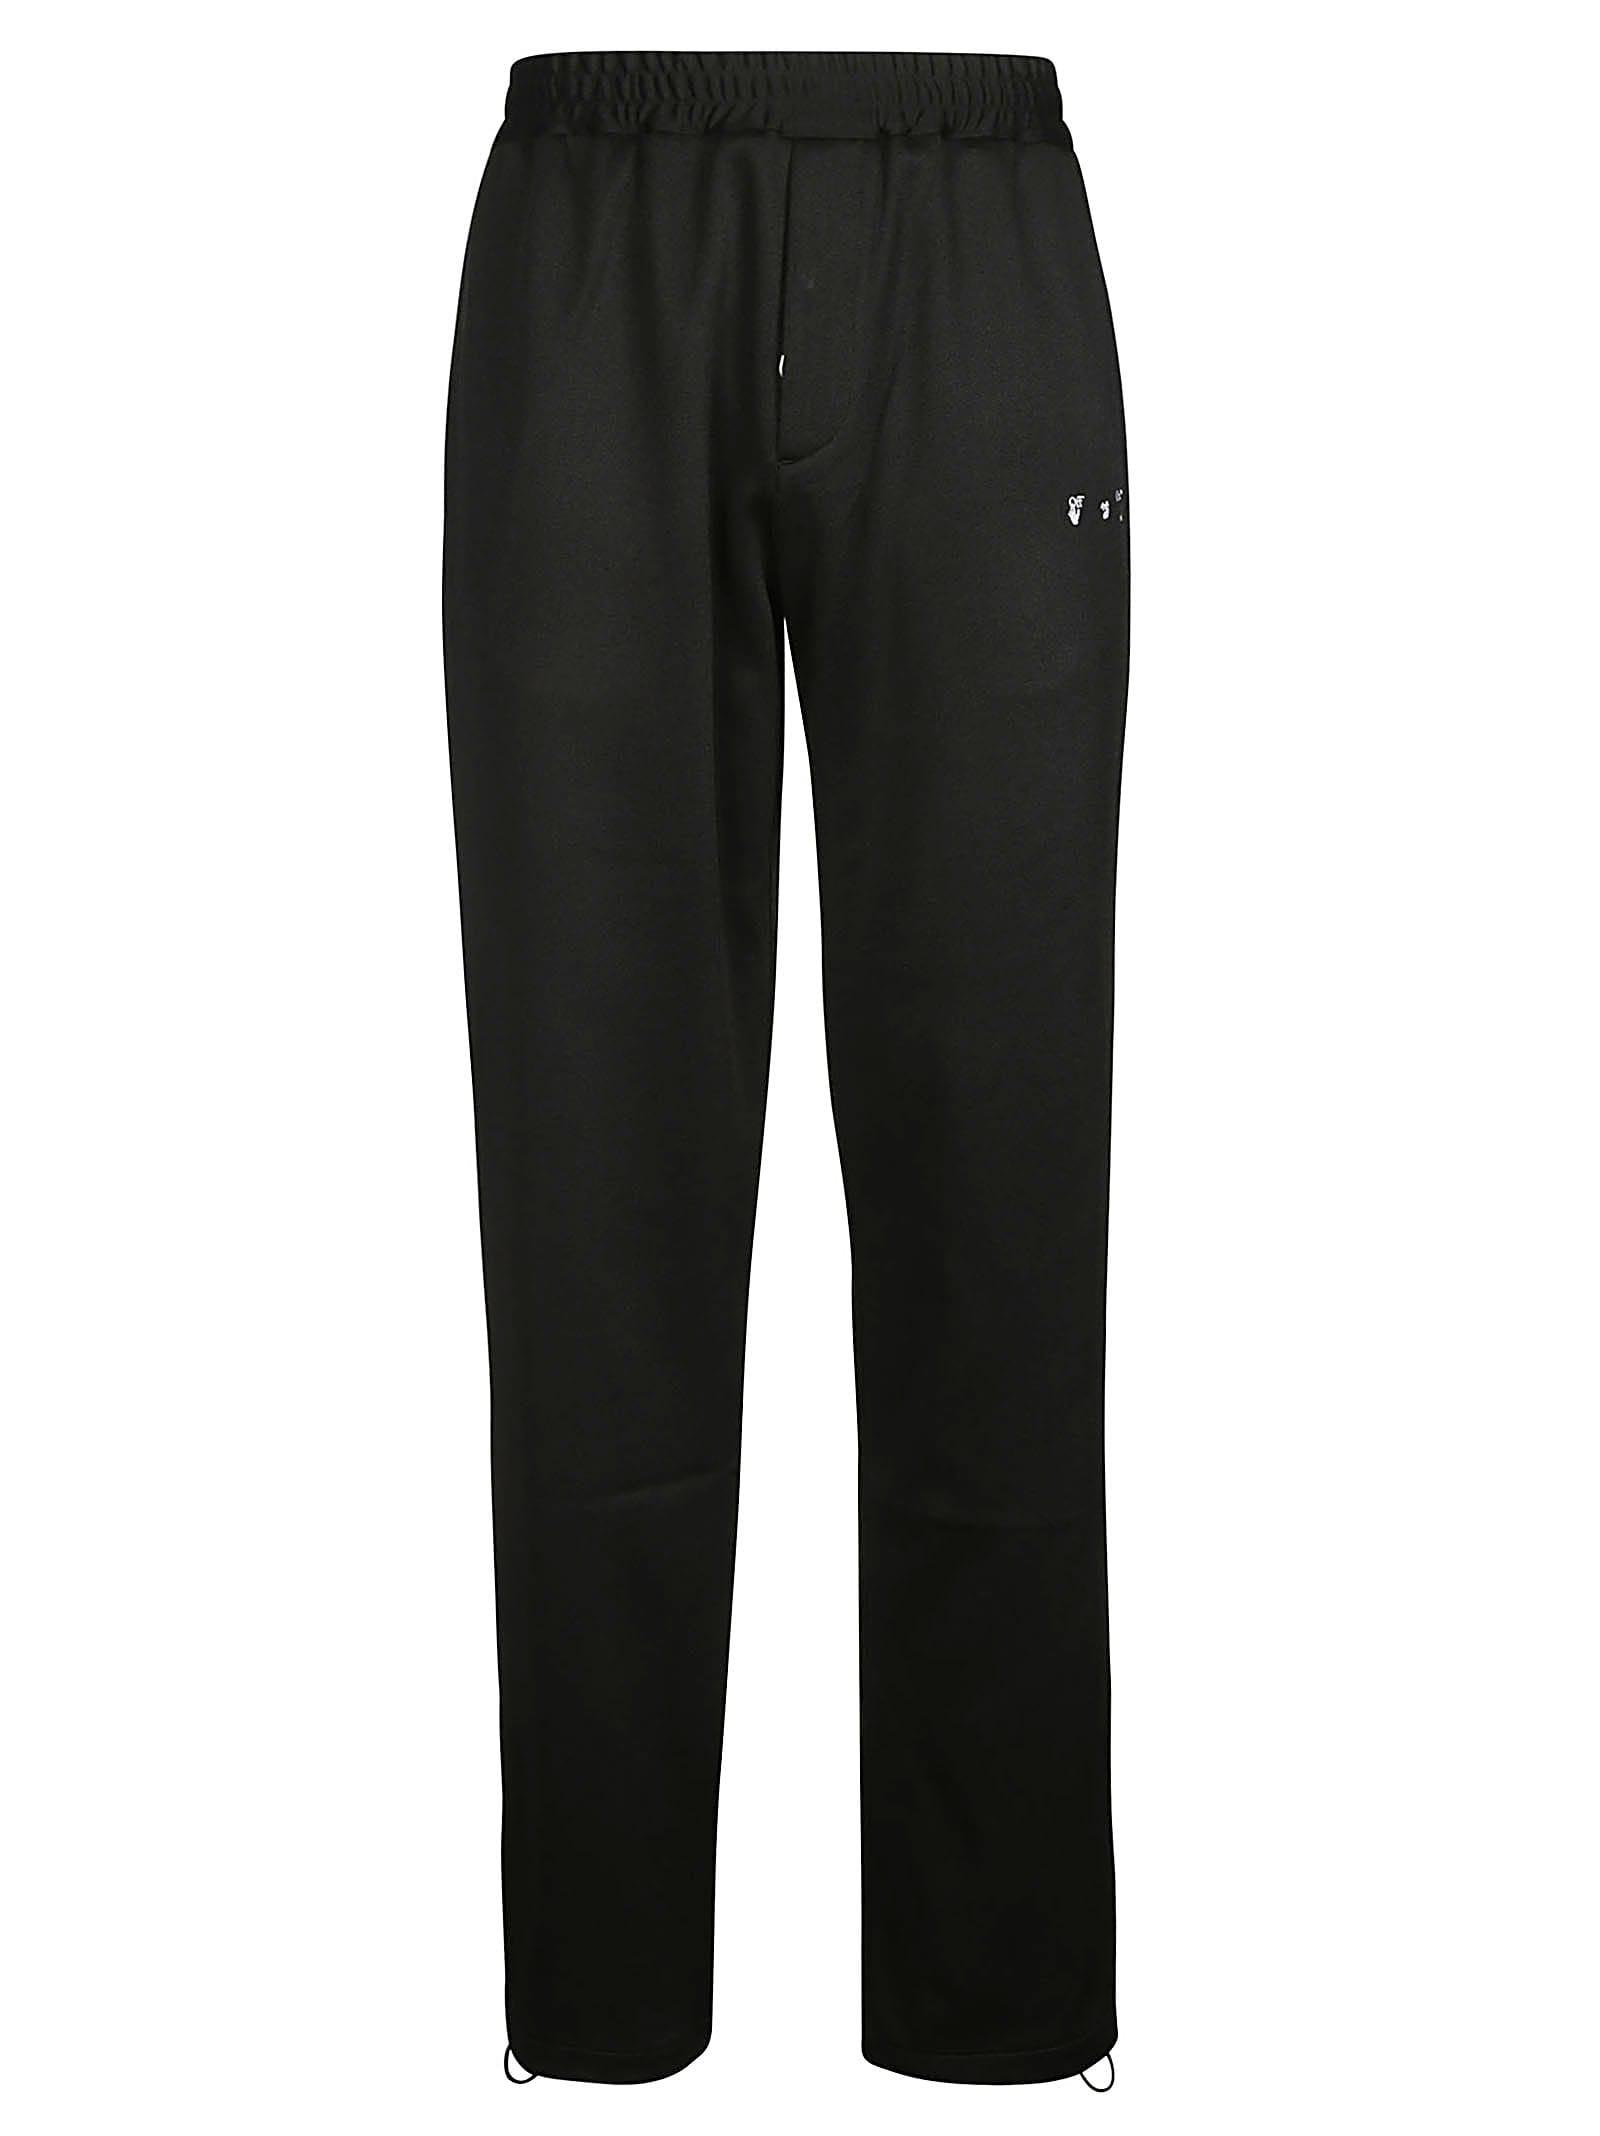 Off-White Pants SLIM TRACK PANTS